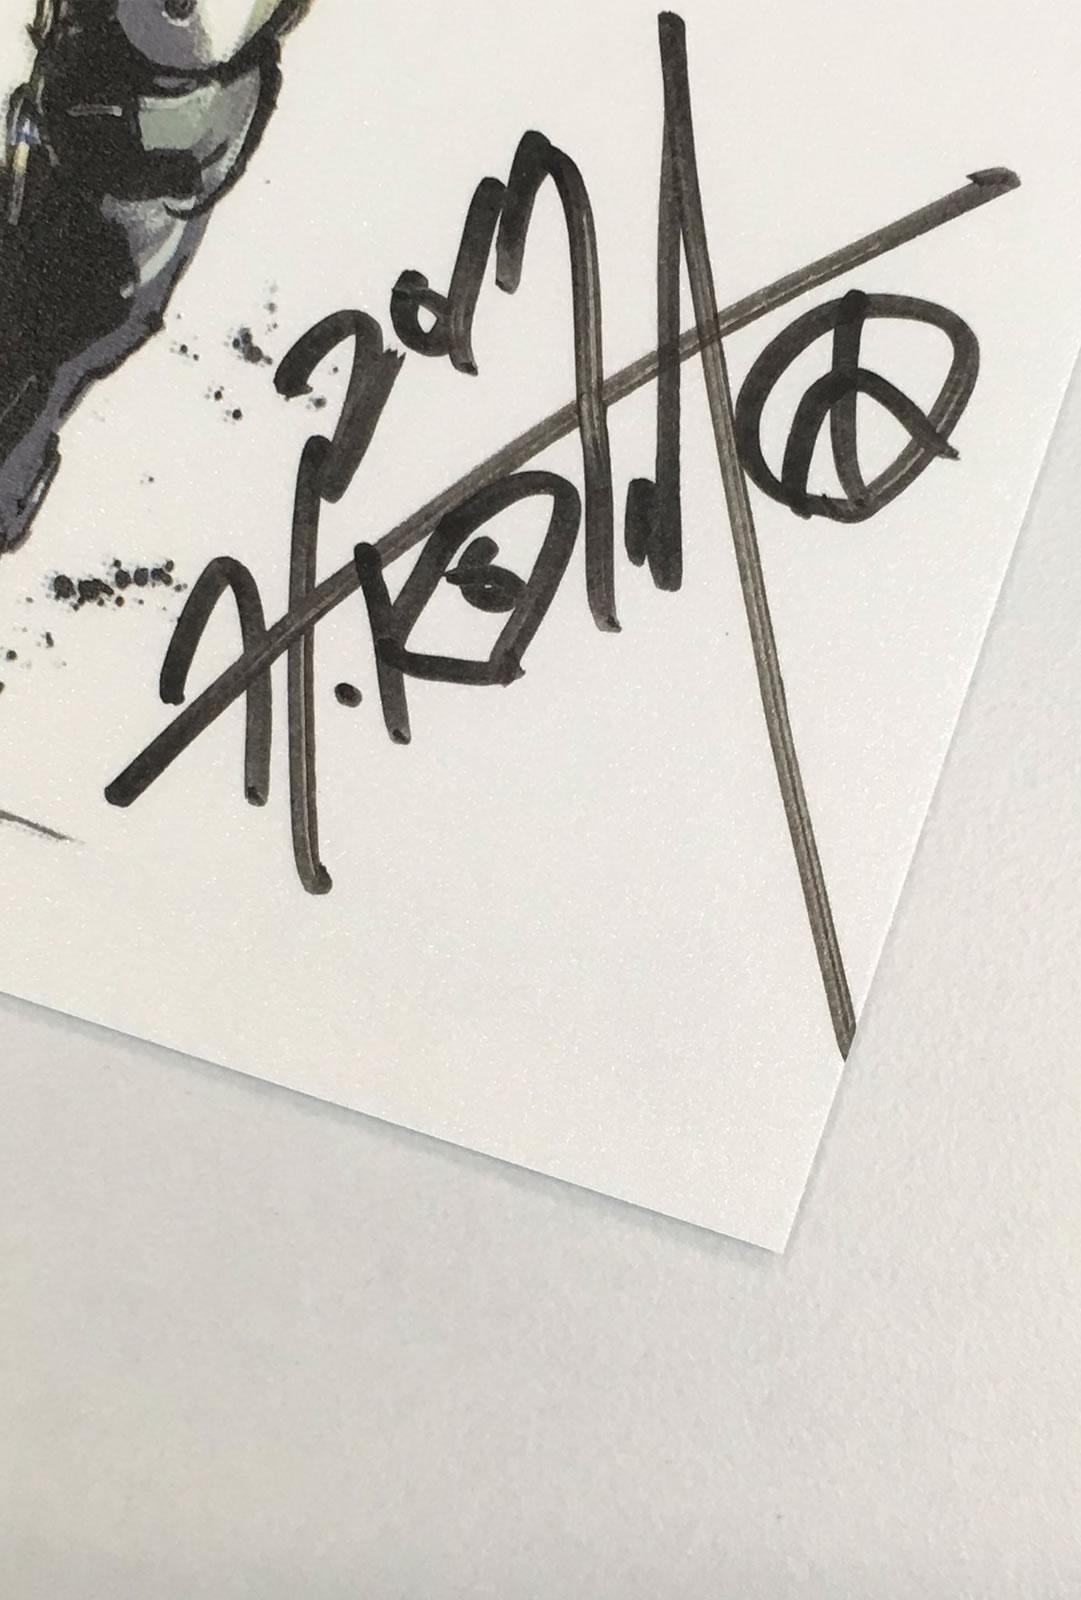 Les bons vœux de Kojima Productions avec un nouvel artwork inédit de Yoji Shinkawa